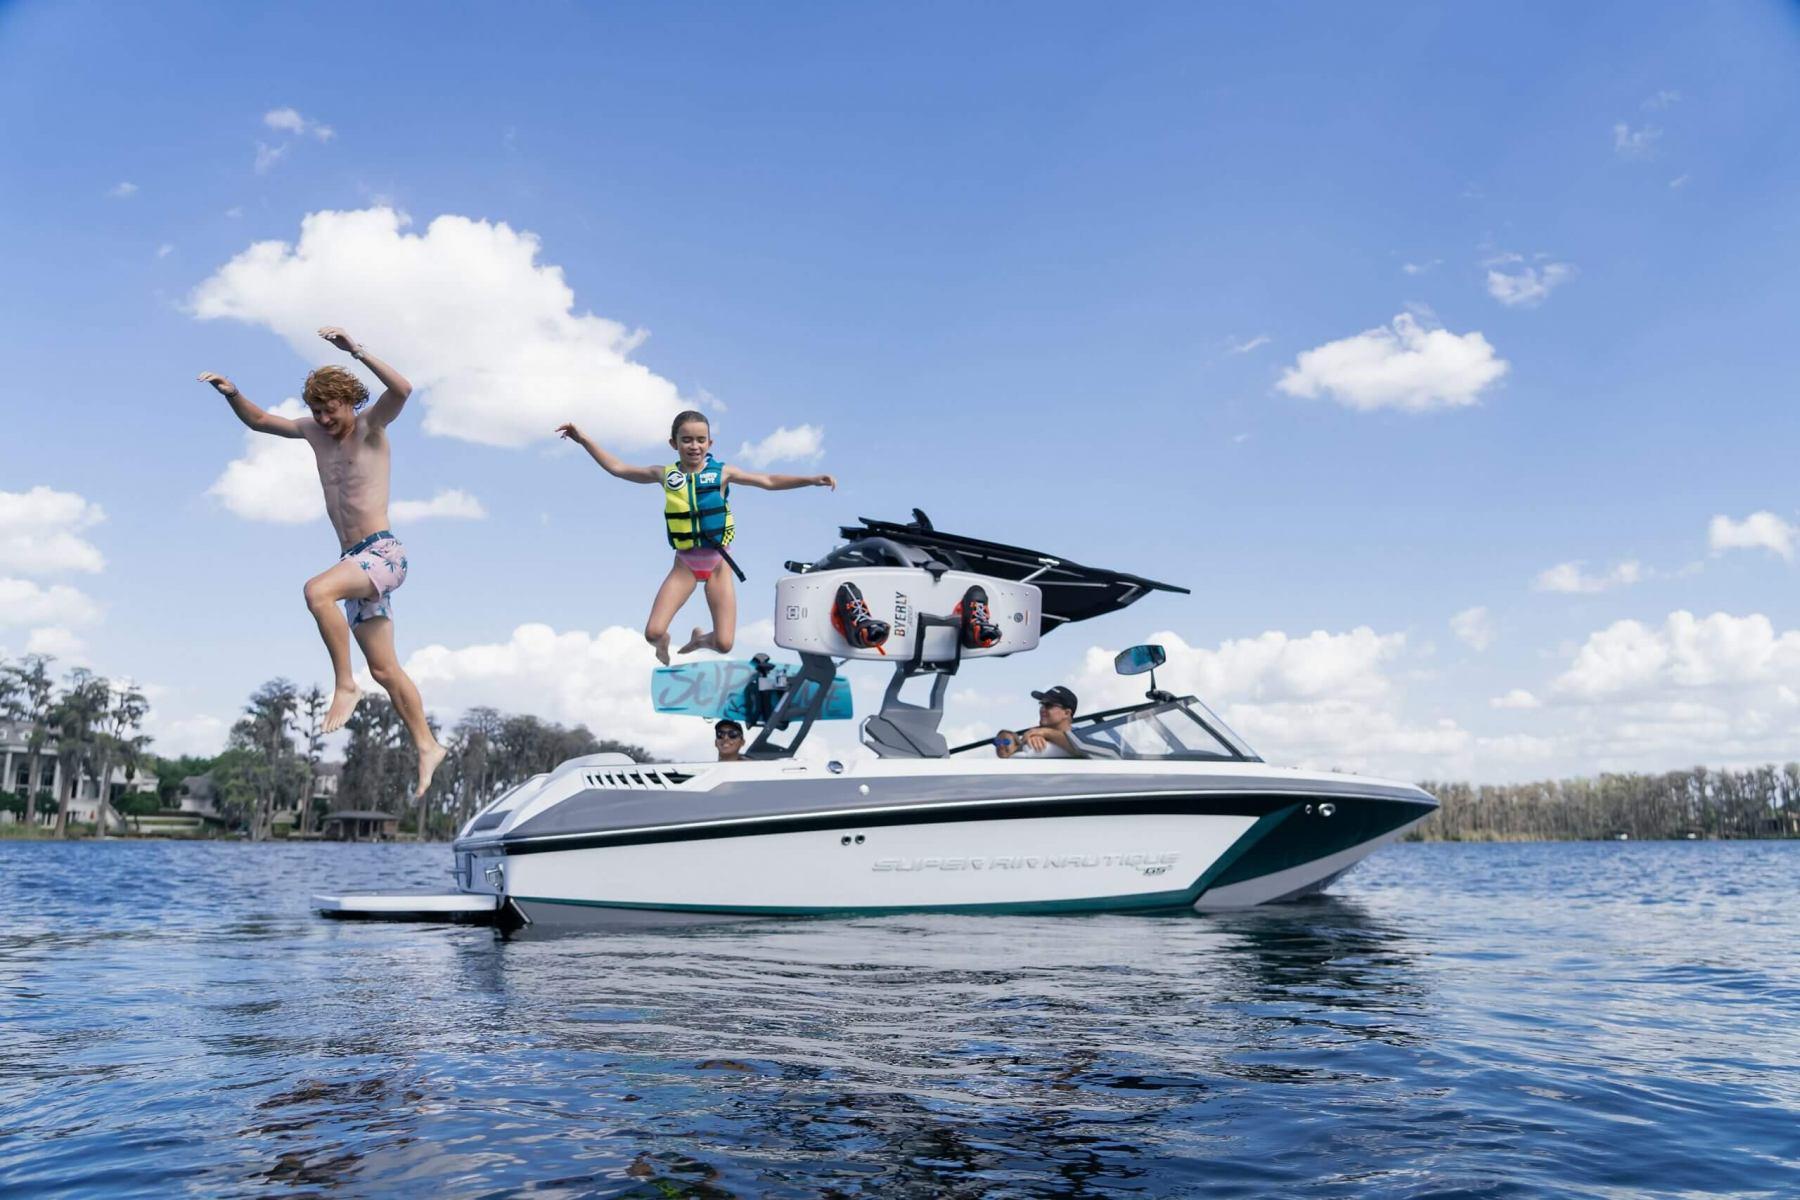 Lake Lifestyle on a 2022 Nautique GS20 Wake Boat